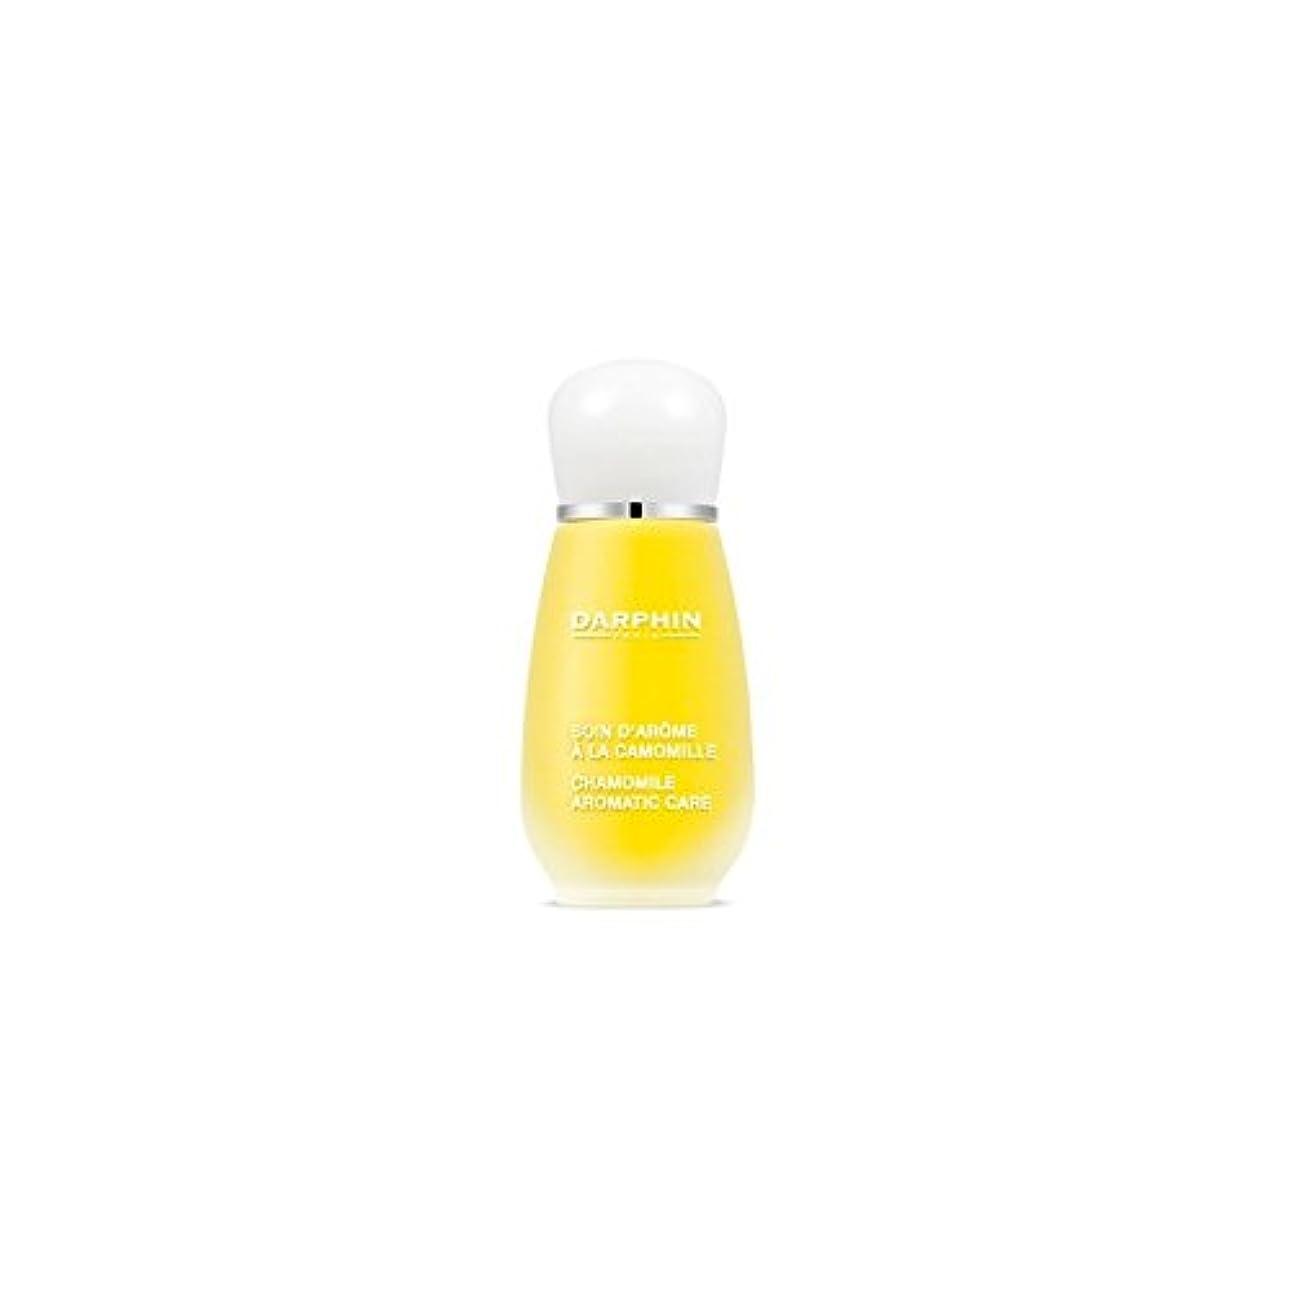 Darphin Chamomile Aromatic Care (15ml) - ダルファンカモミール芳香ケア(15ミリリットル) [並行輸入品]